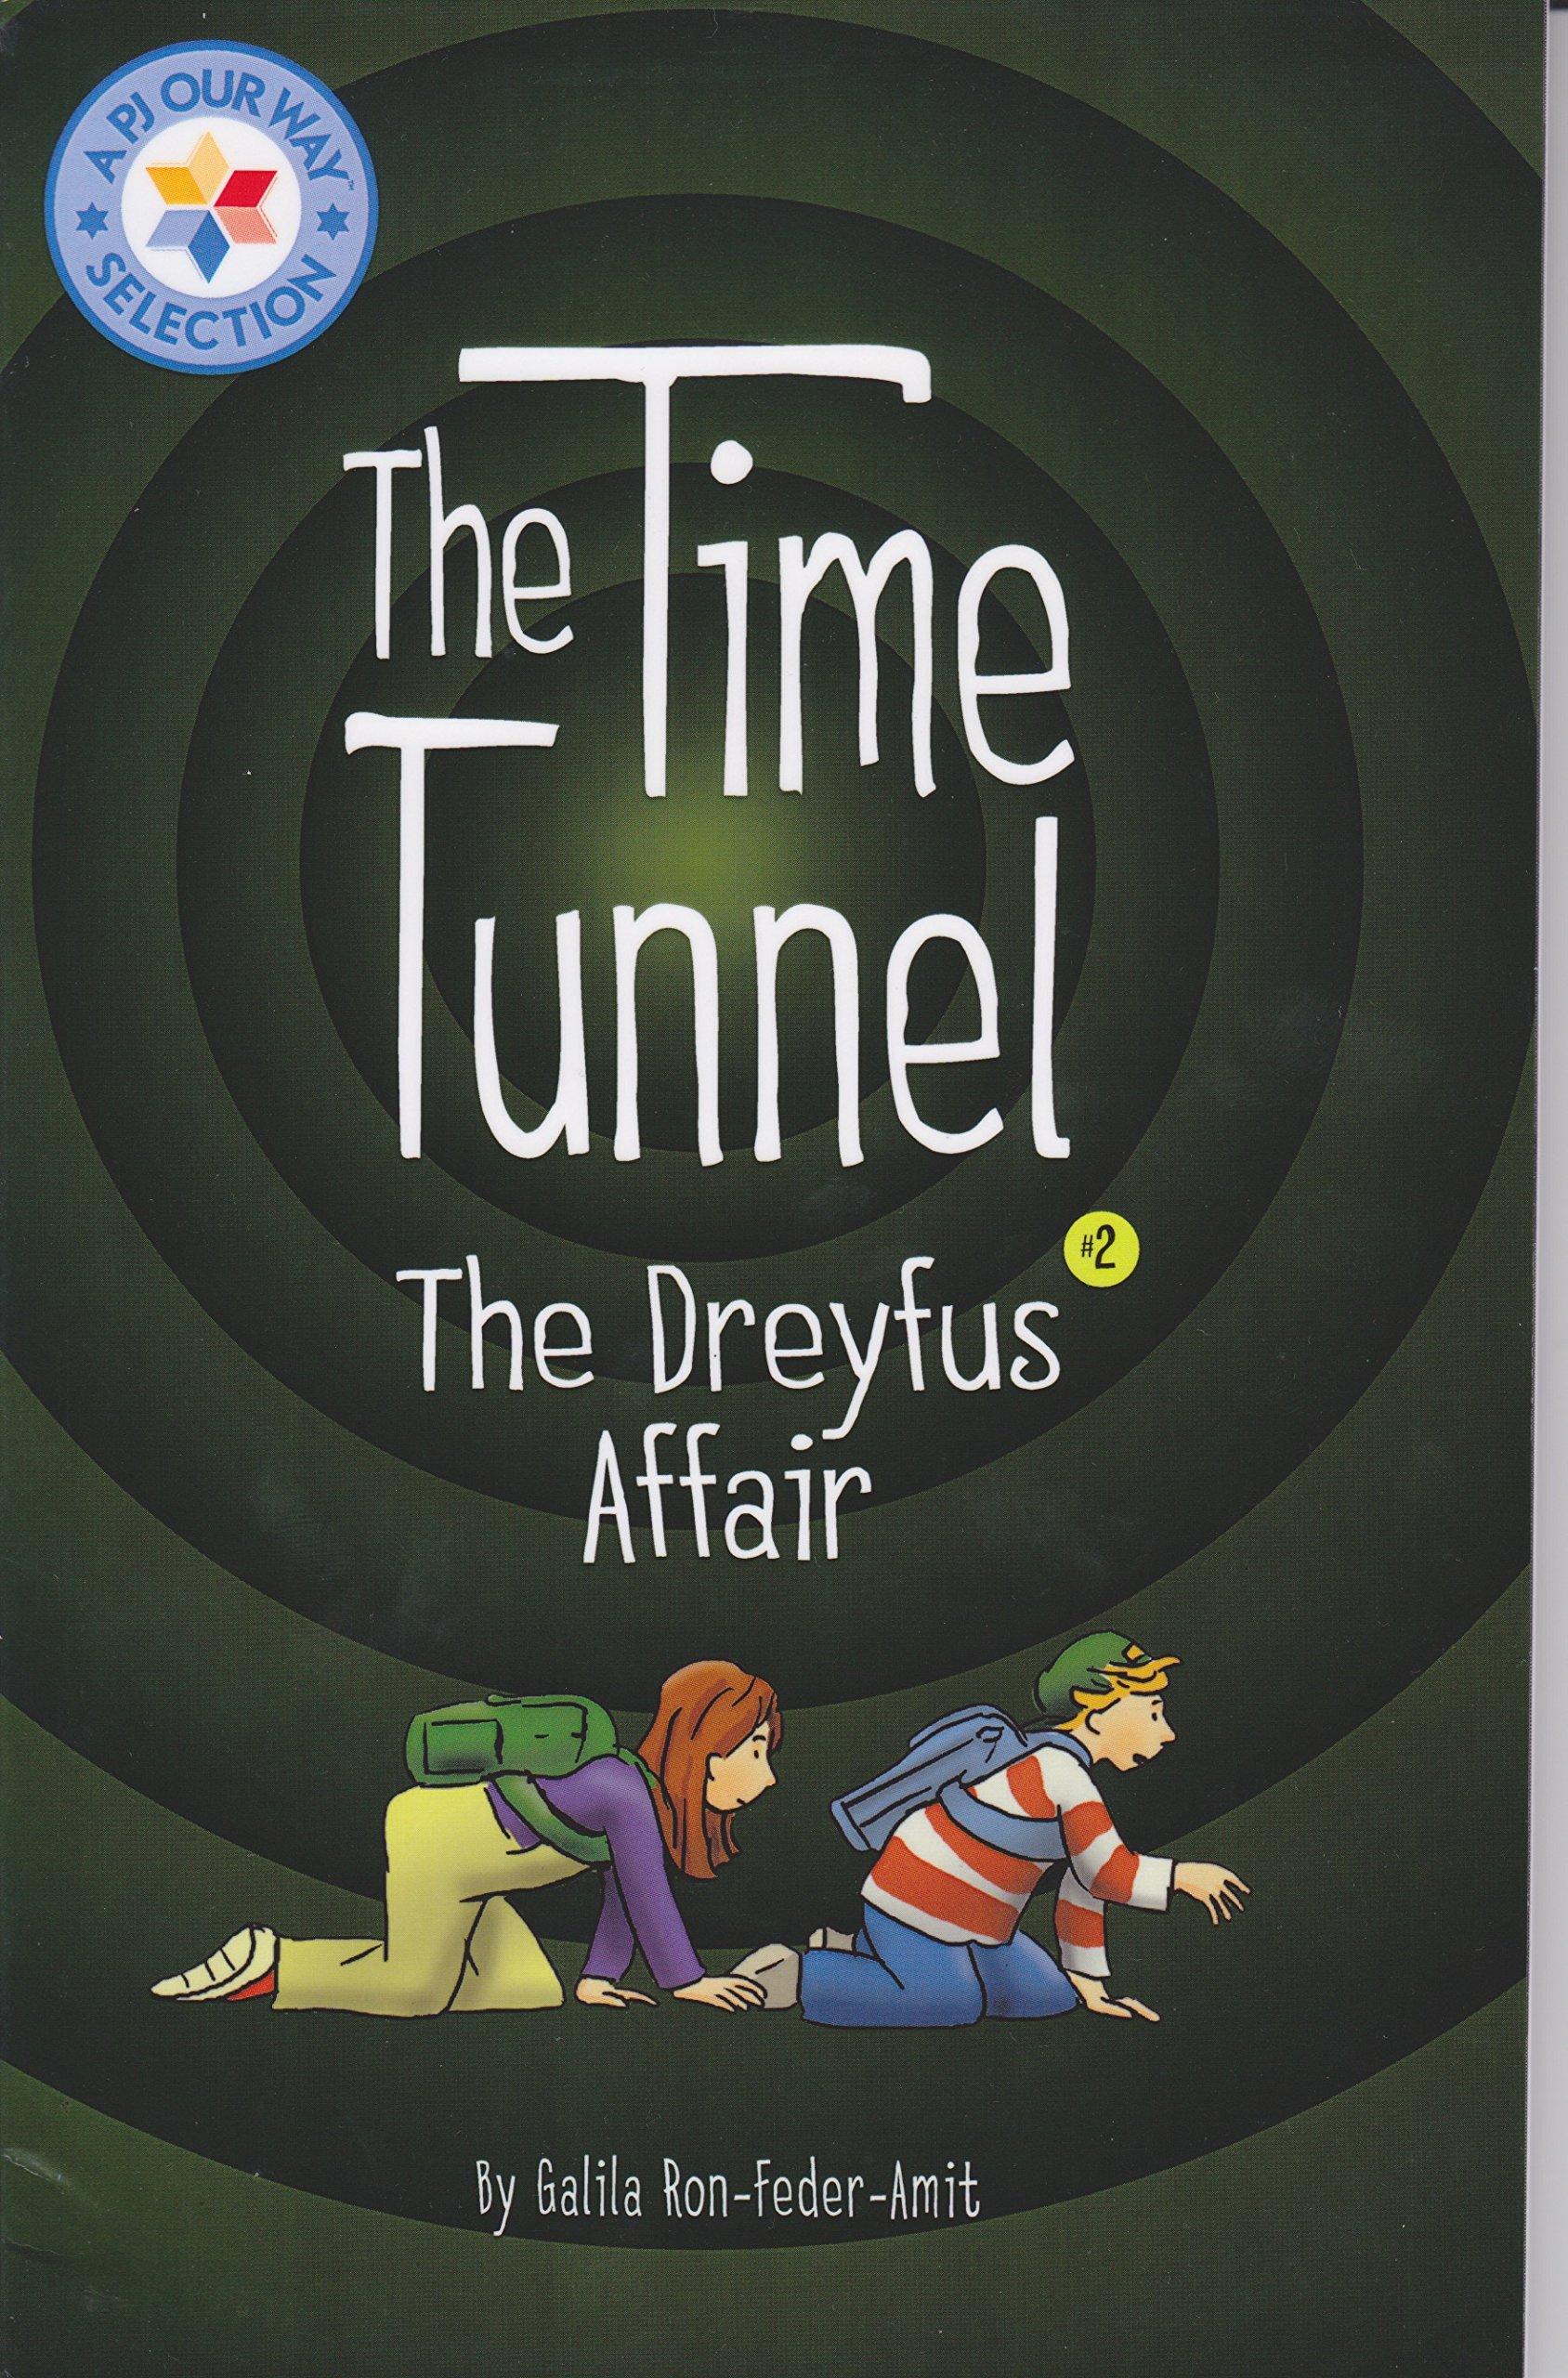 The Time Tunnel 2: The Dreyfus Affair (English Translation): Galia  Ron-Feder-Amit: Amazon.com: Books